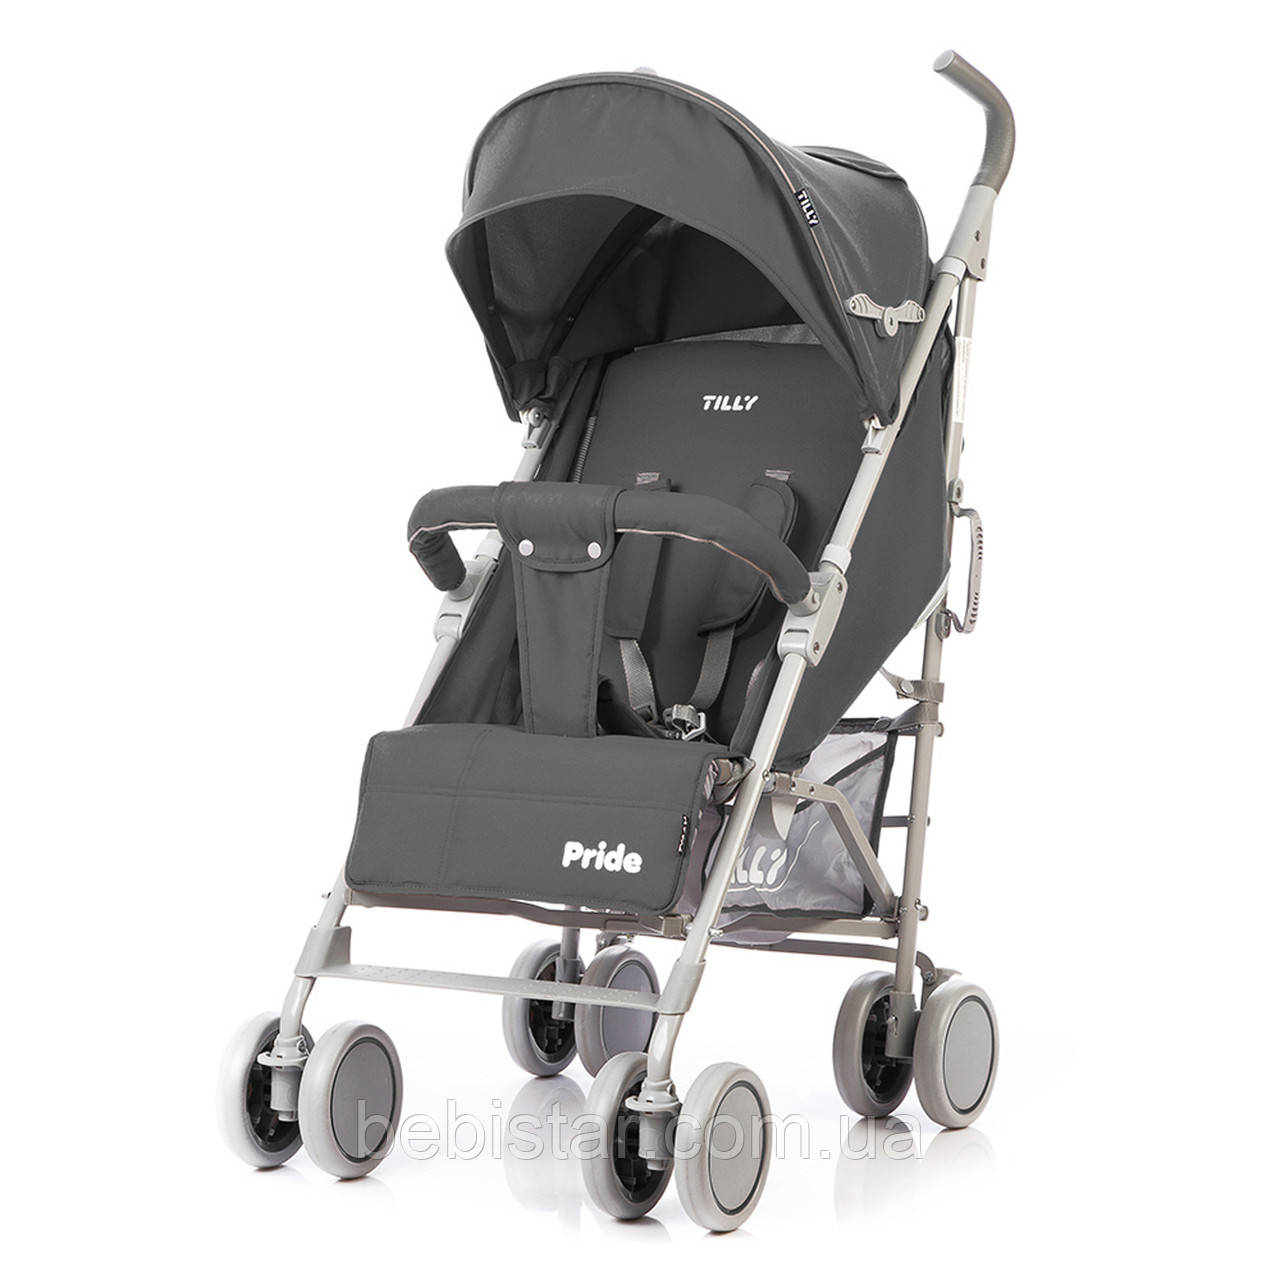 Дитяча прогулянкова коляска TILLY Pride T-1412 Dark Grey